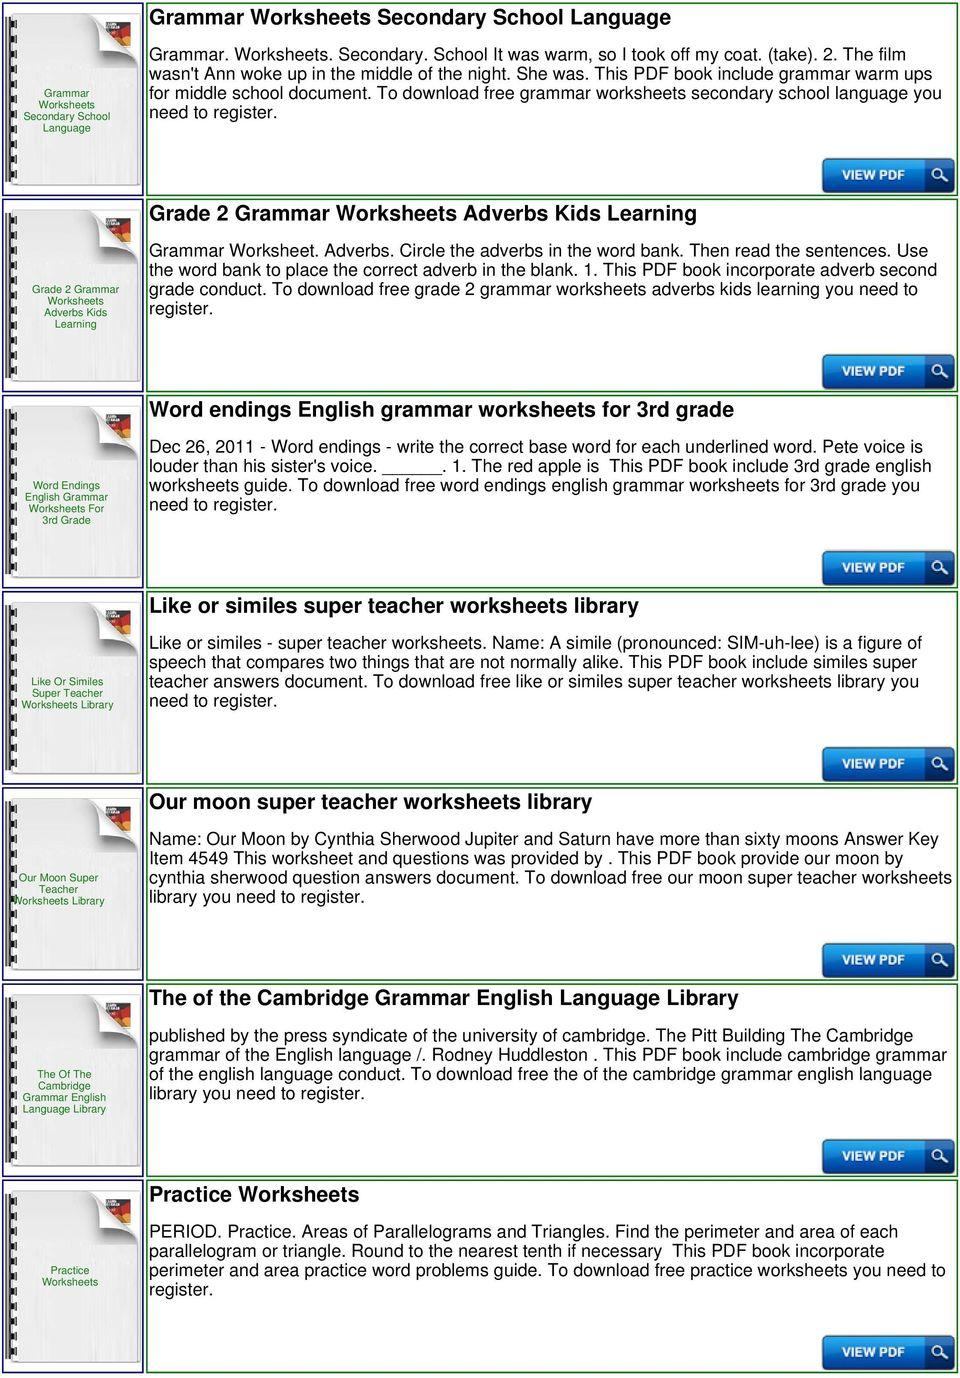 medium resolution of Esl Library Grammar Practice Worksheets - PDF Free Download